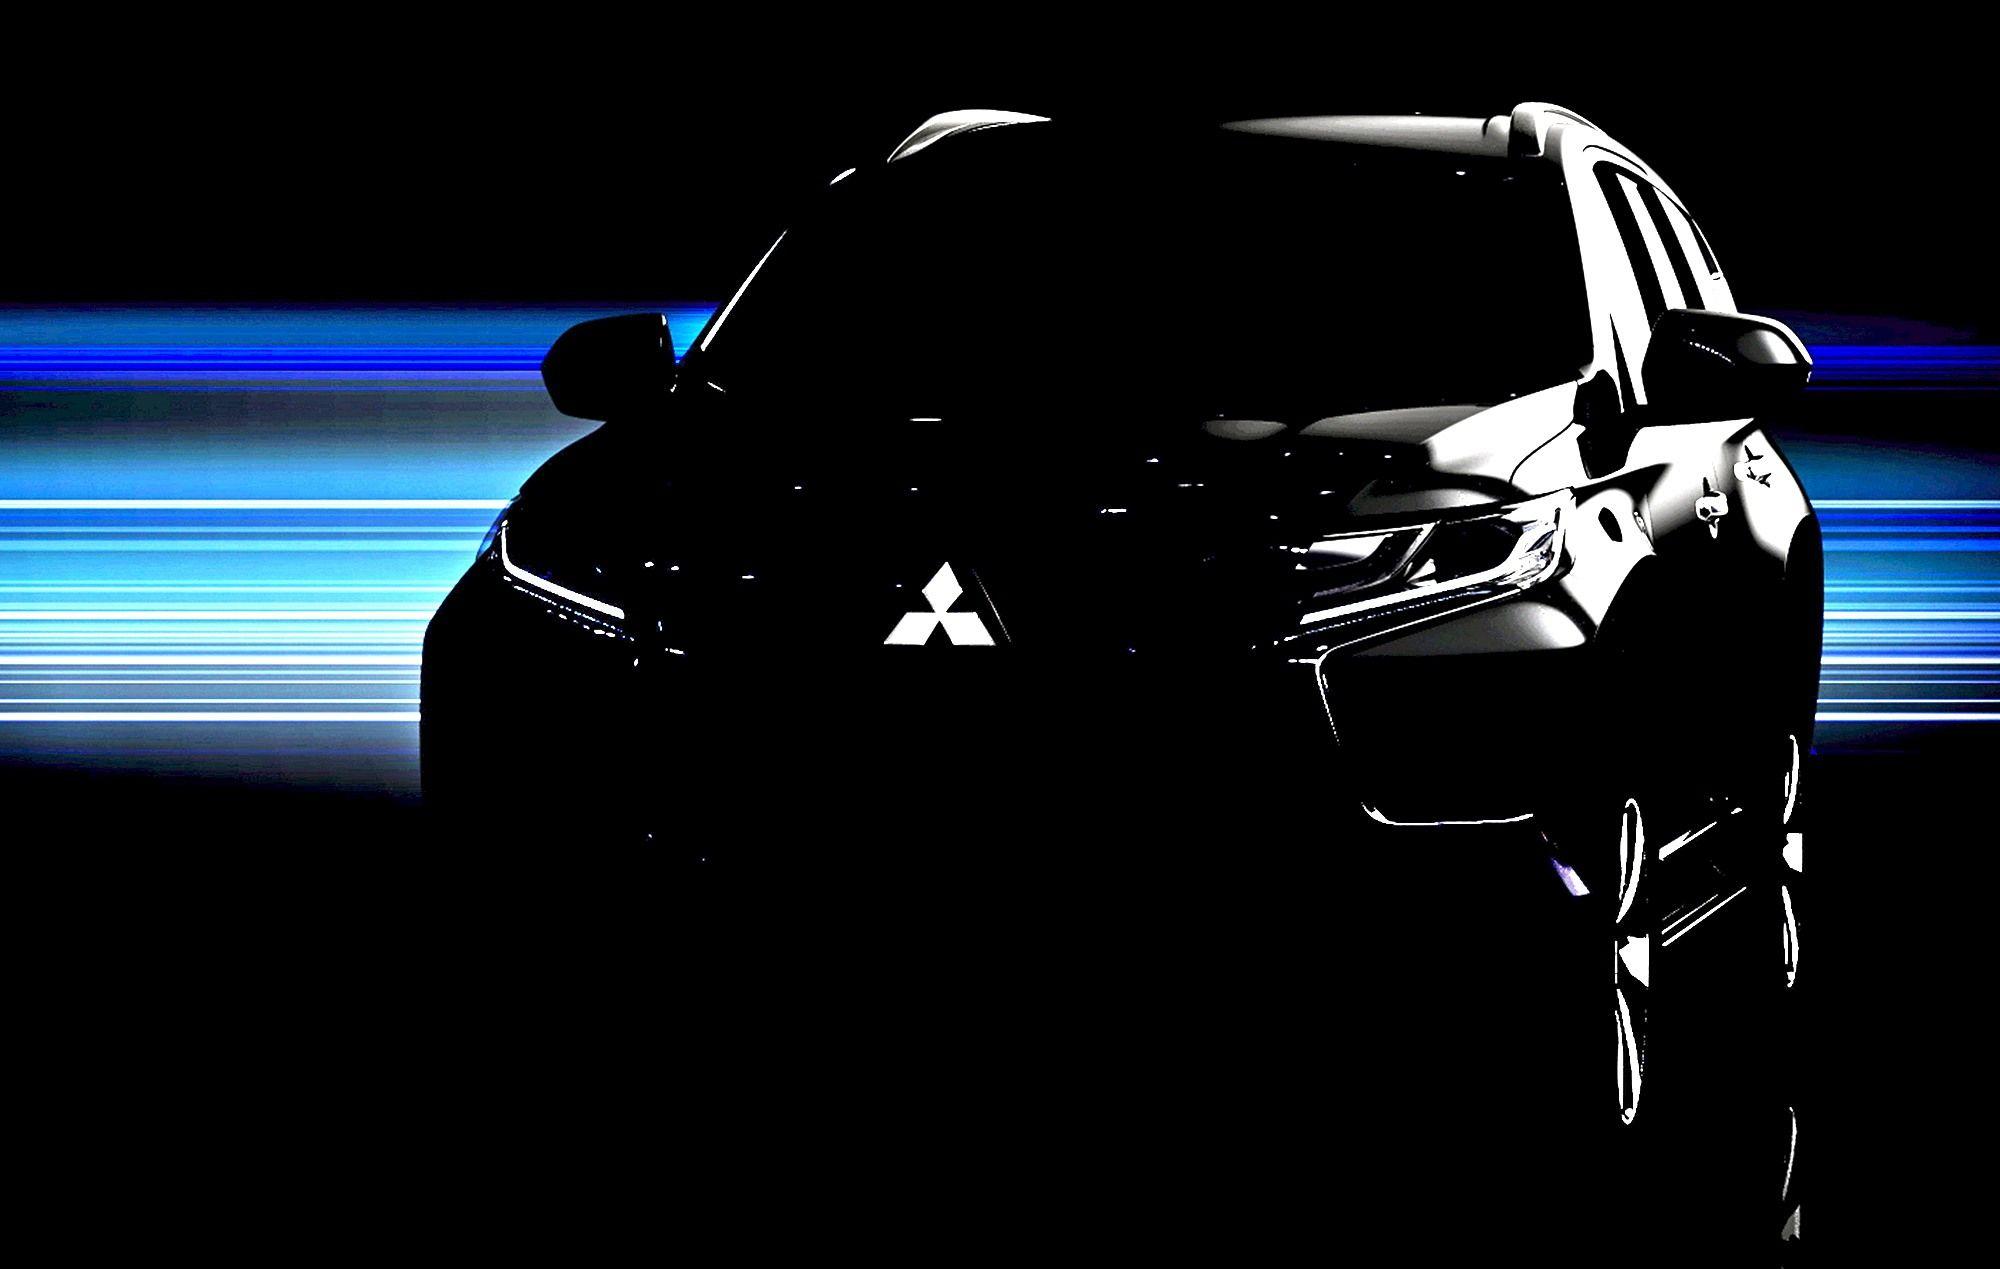 India-bound 2016 - Mitsubishi Pajero Sport Hd , HD Wallpaper & Backgrounds